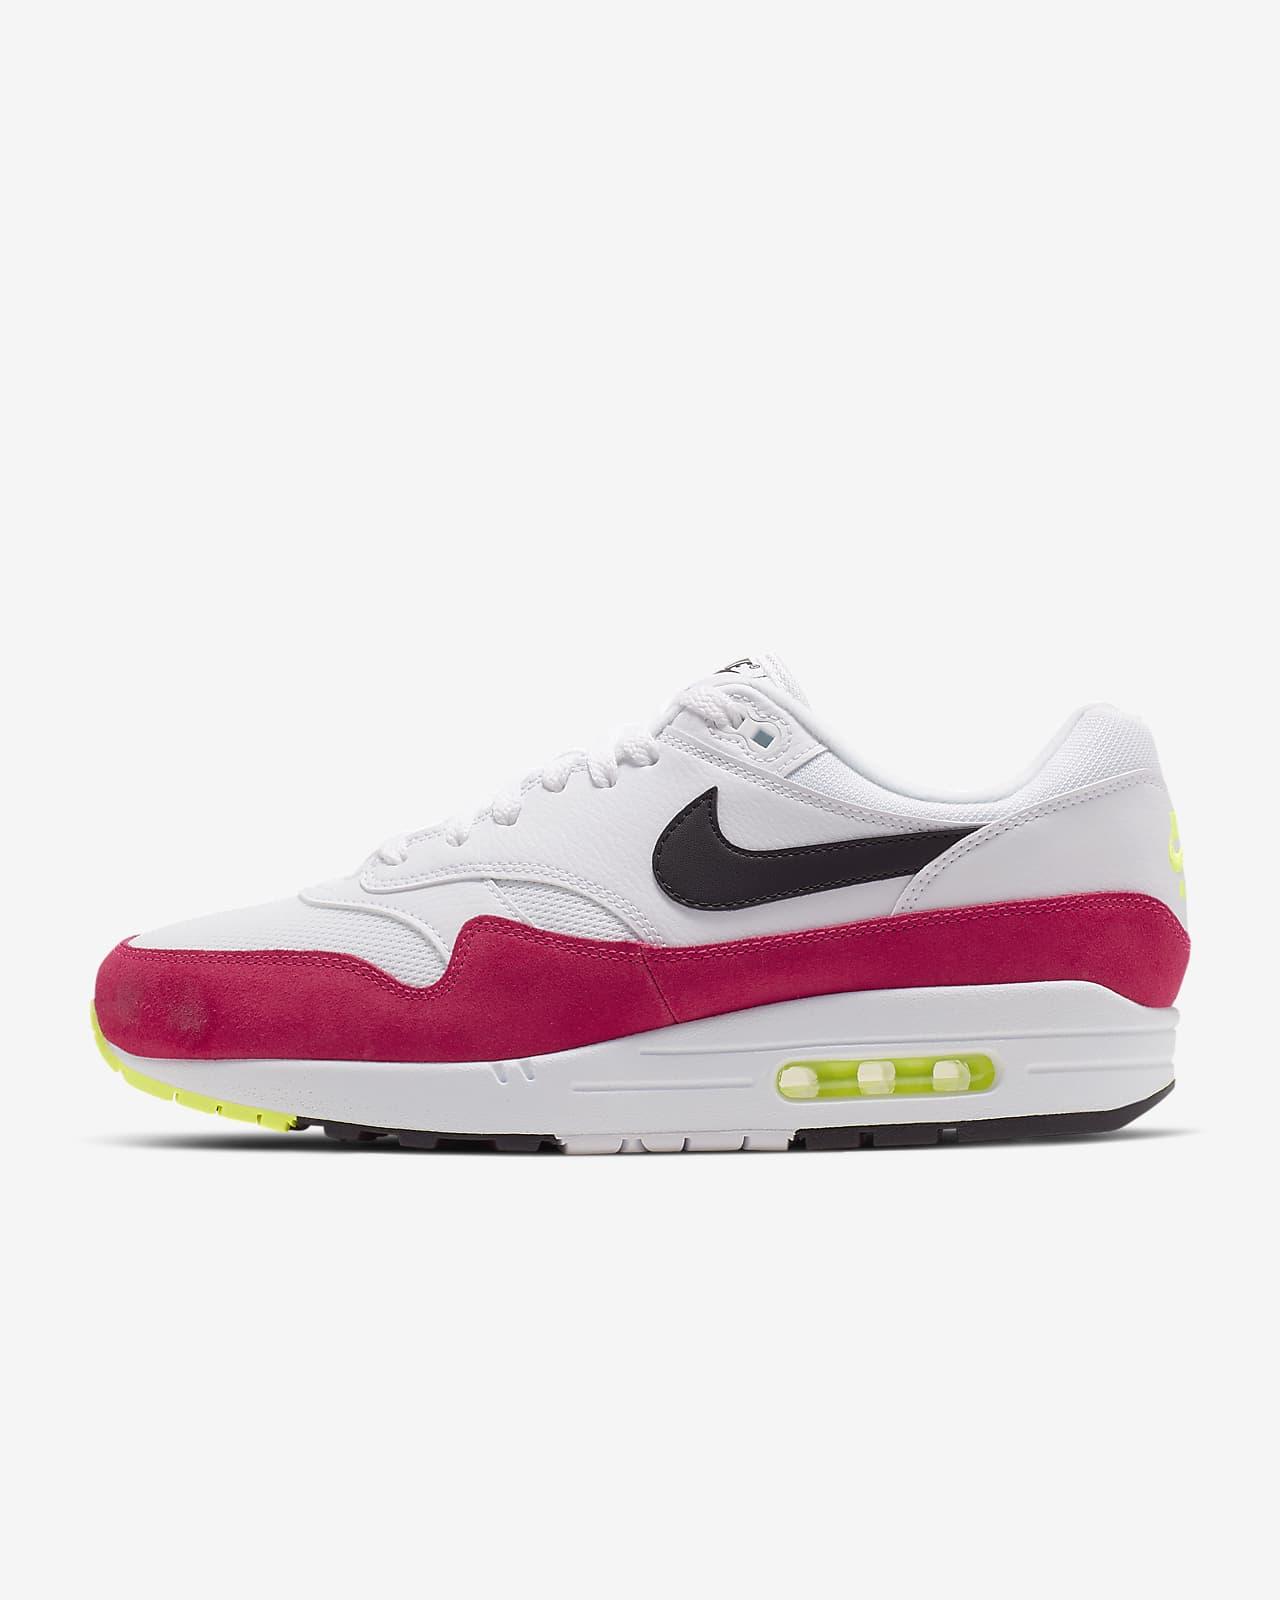 Nike Air Max 1 男子运动鞋